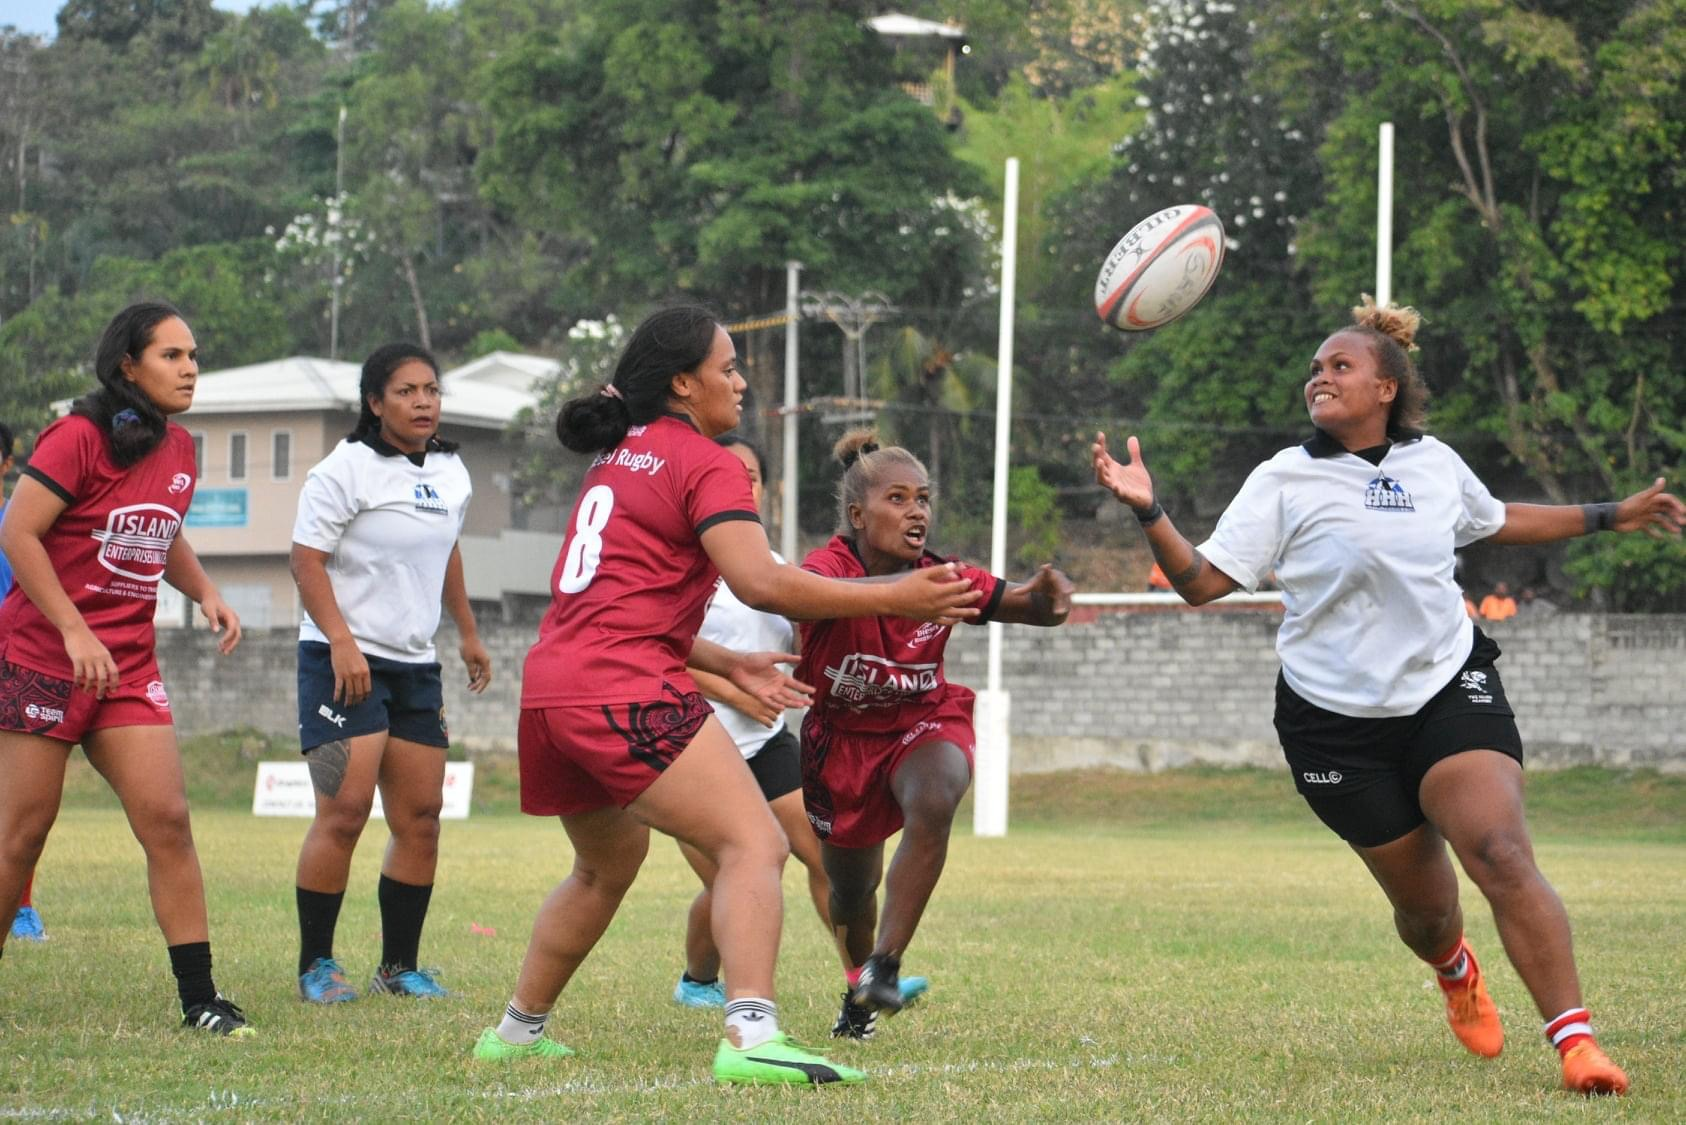 Solomon Islands Sevens Competition Semi final action between Diesel vs HHH (Image - Elton Lonaratha Jnr/SunSPORTS)